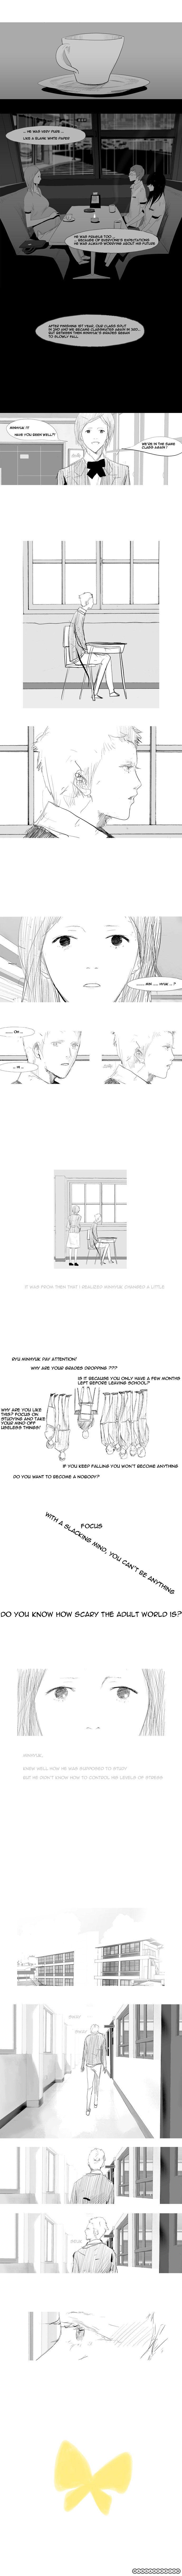 Annarasumanara 25 Page 2